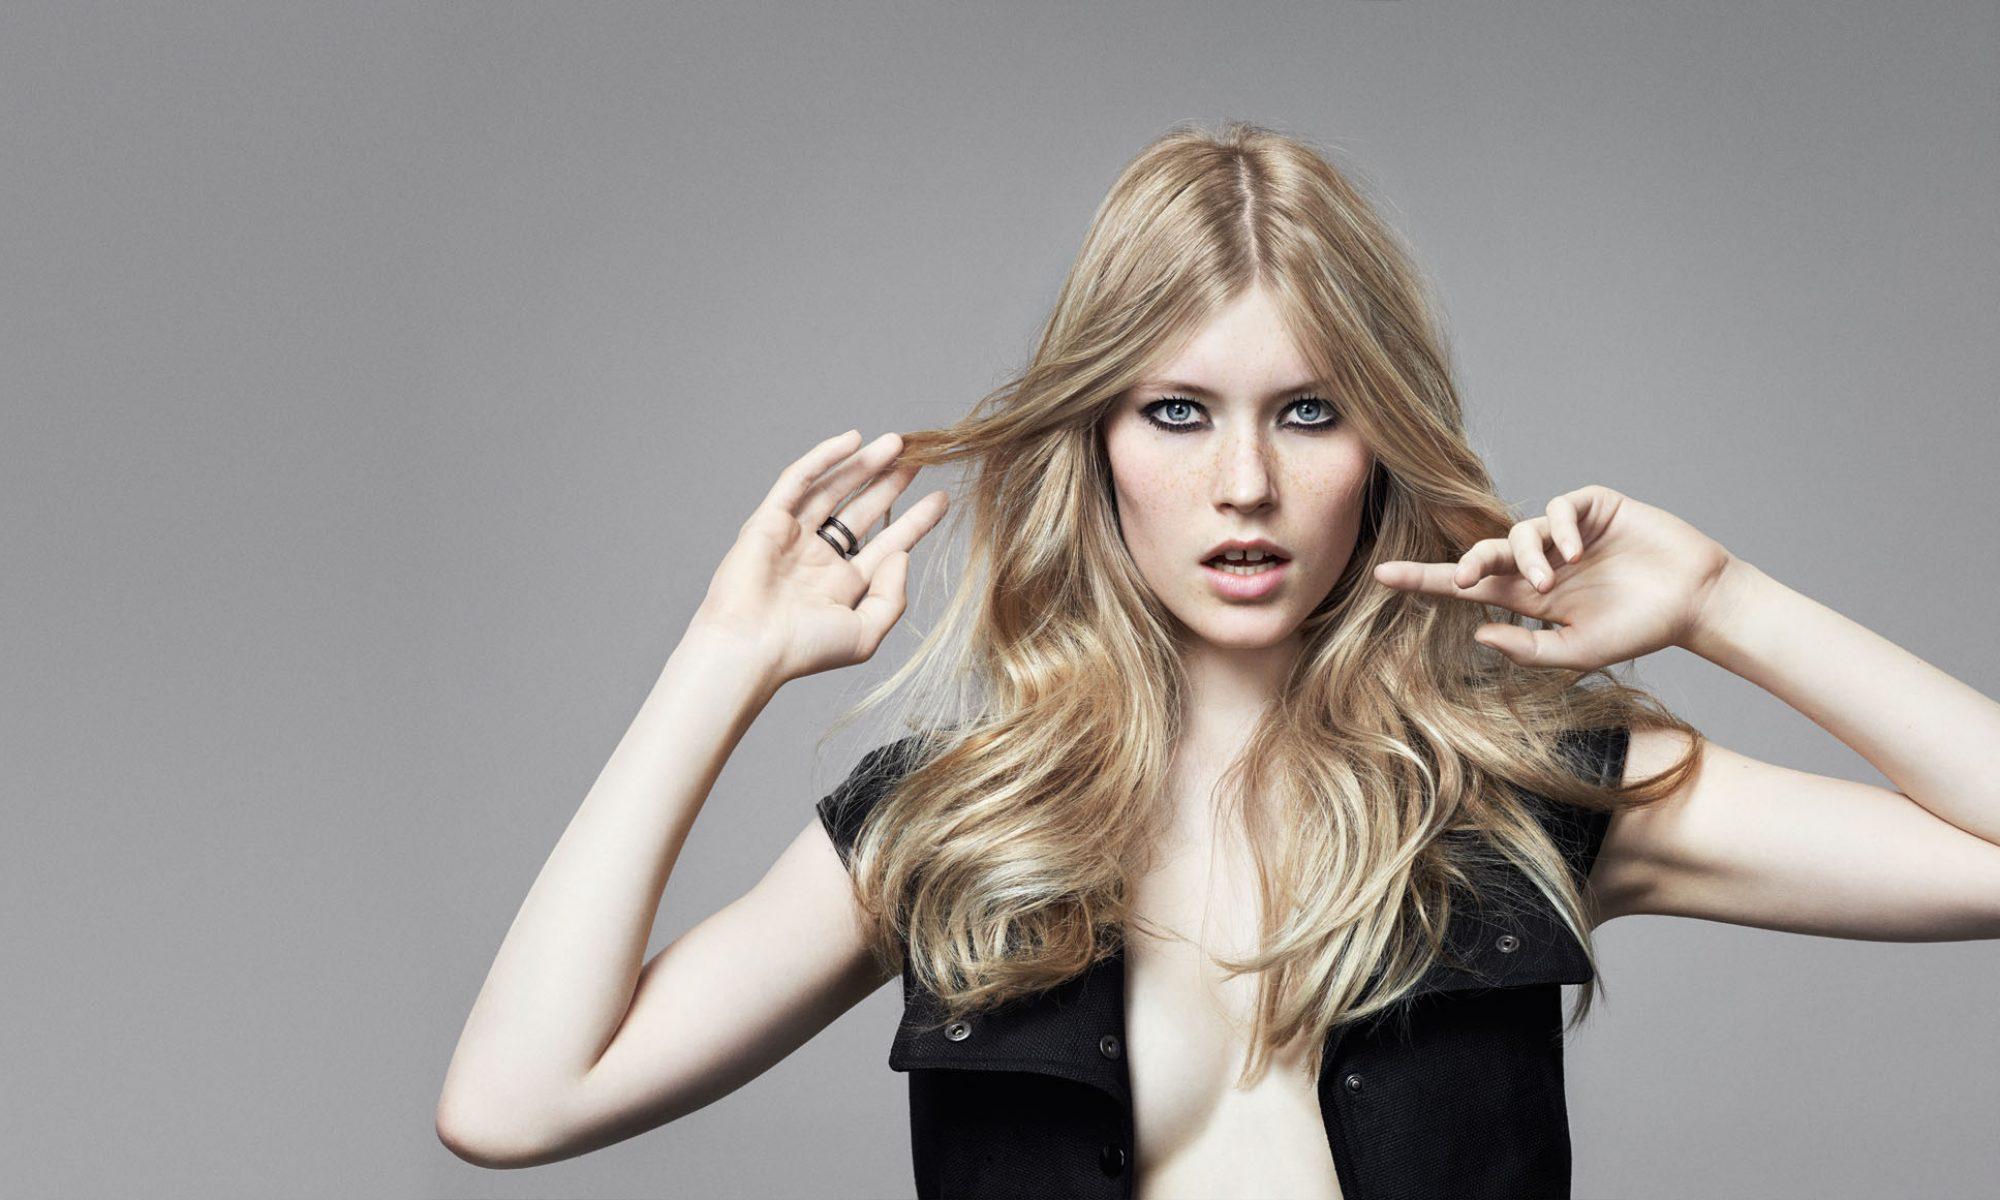 Trendz Hair Studio